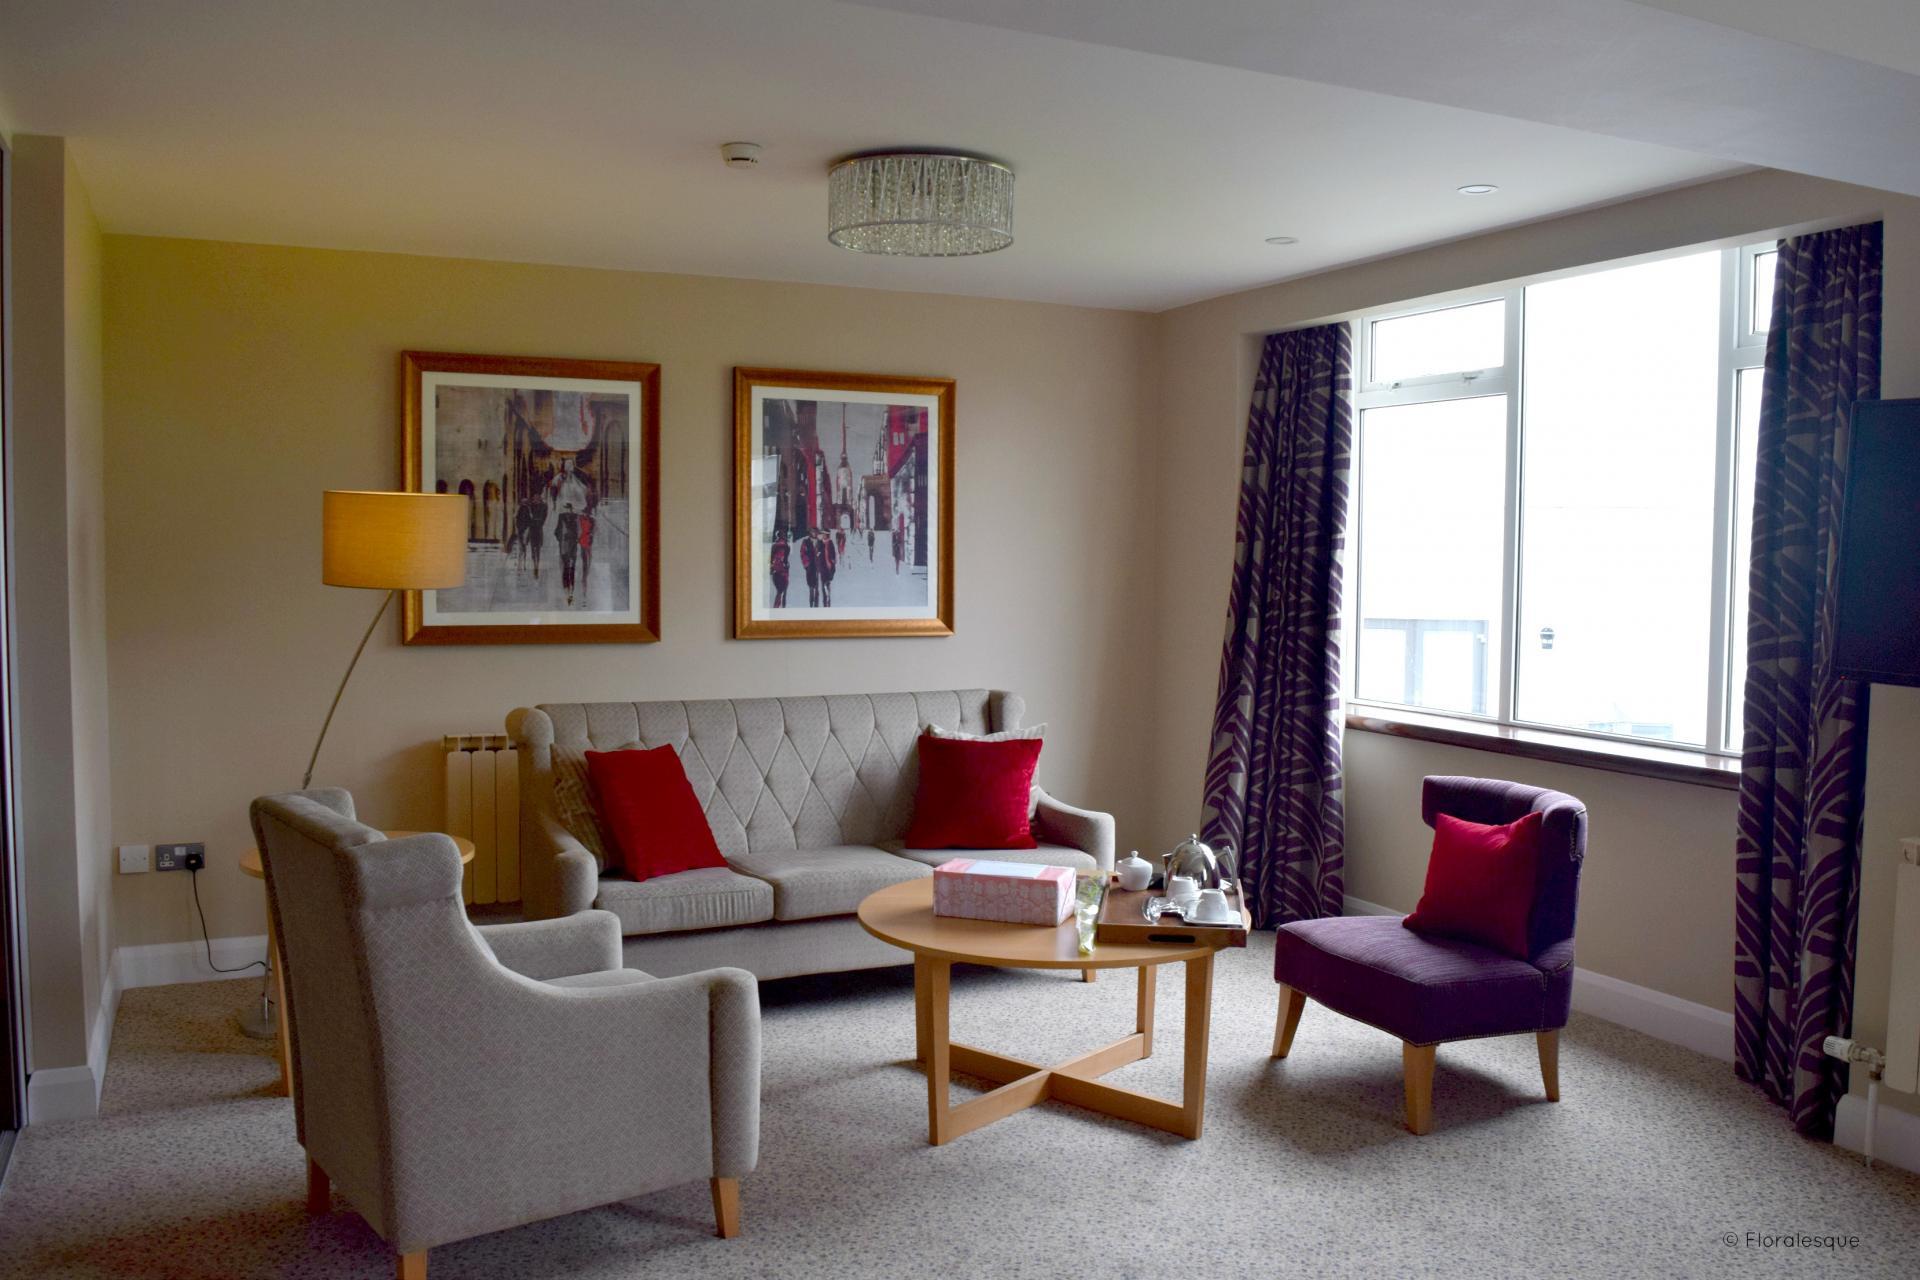 An Afternoon in the Sligo Park Hotel